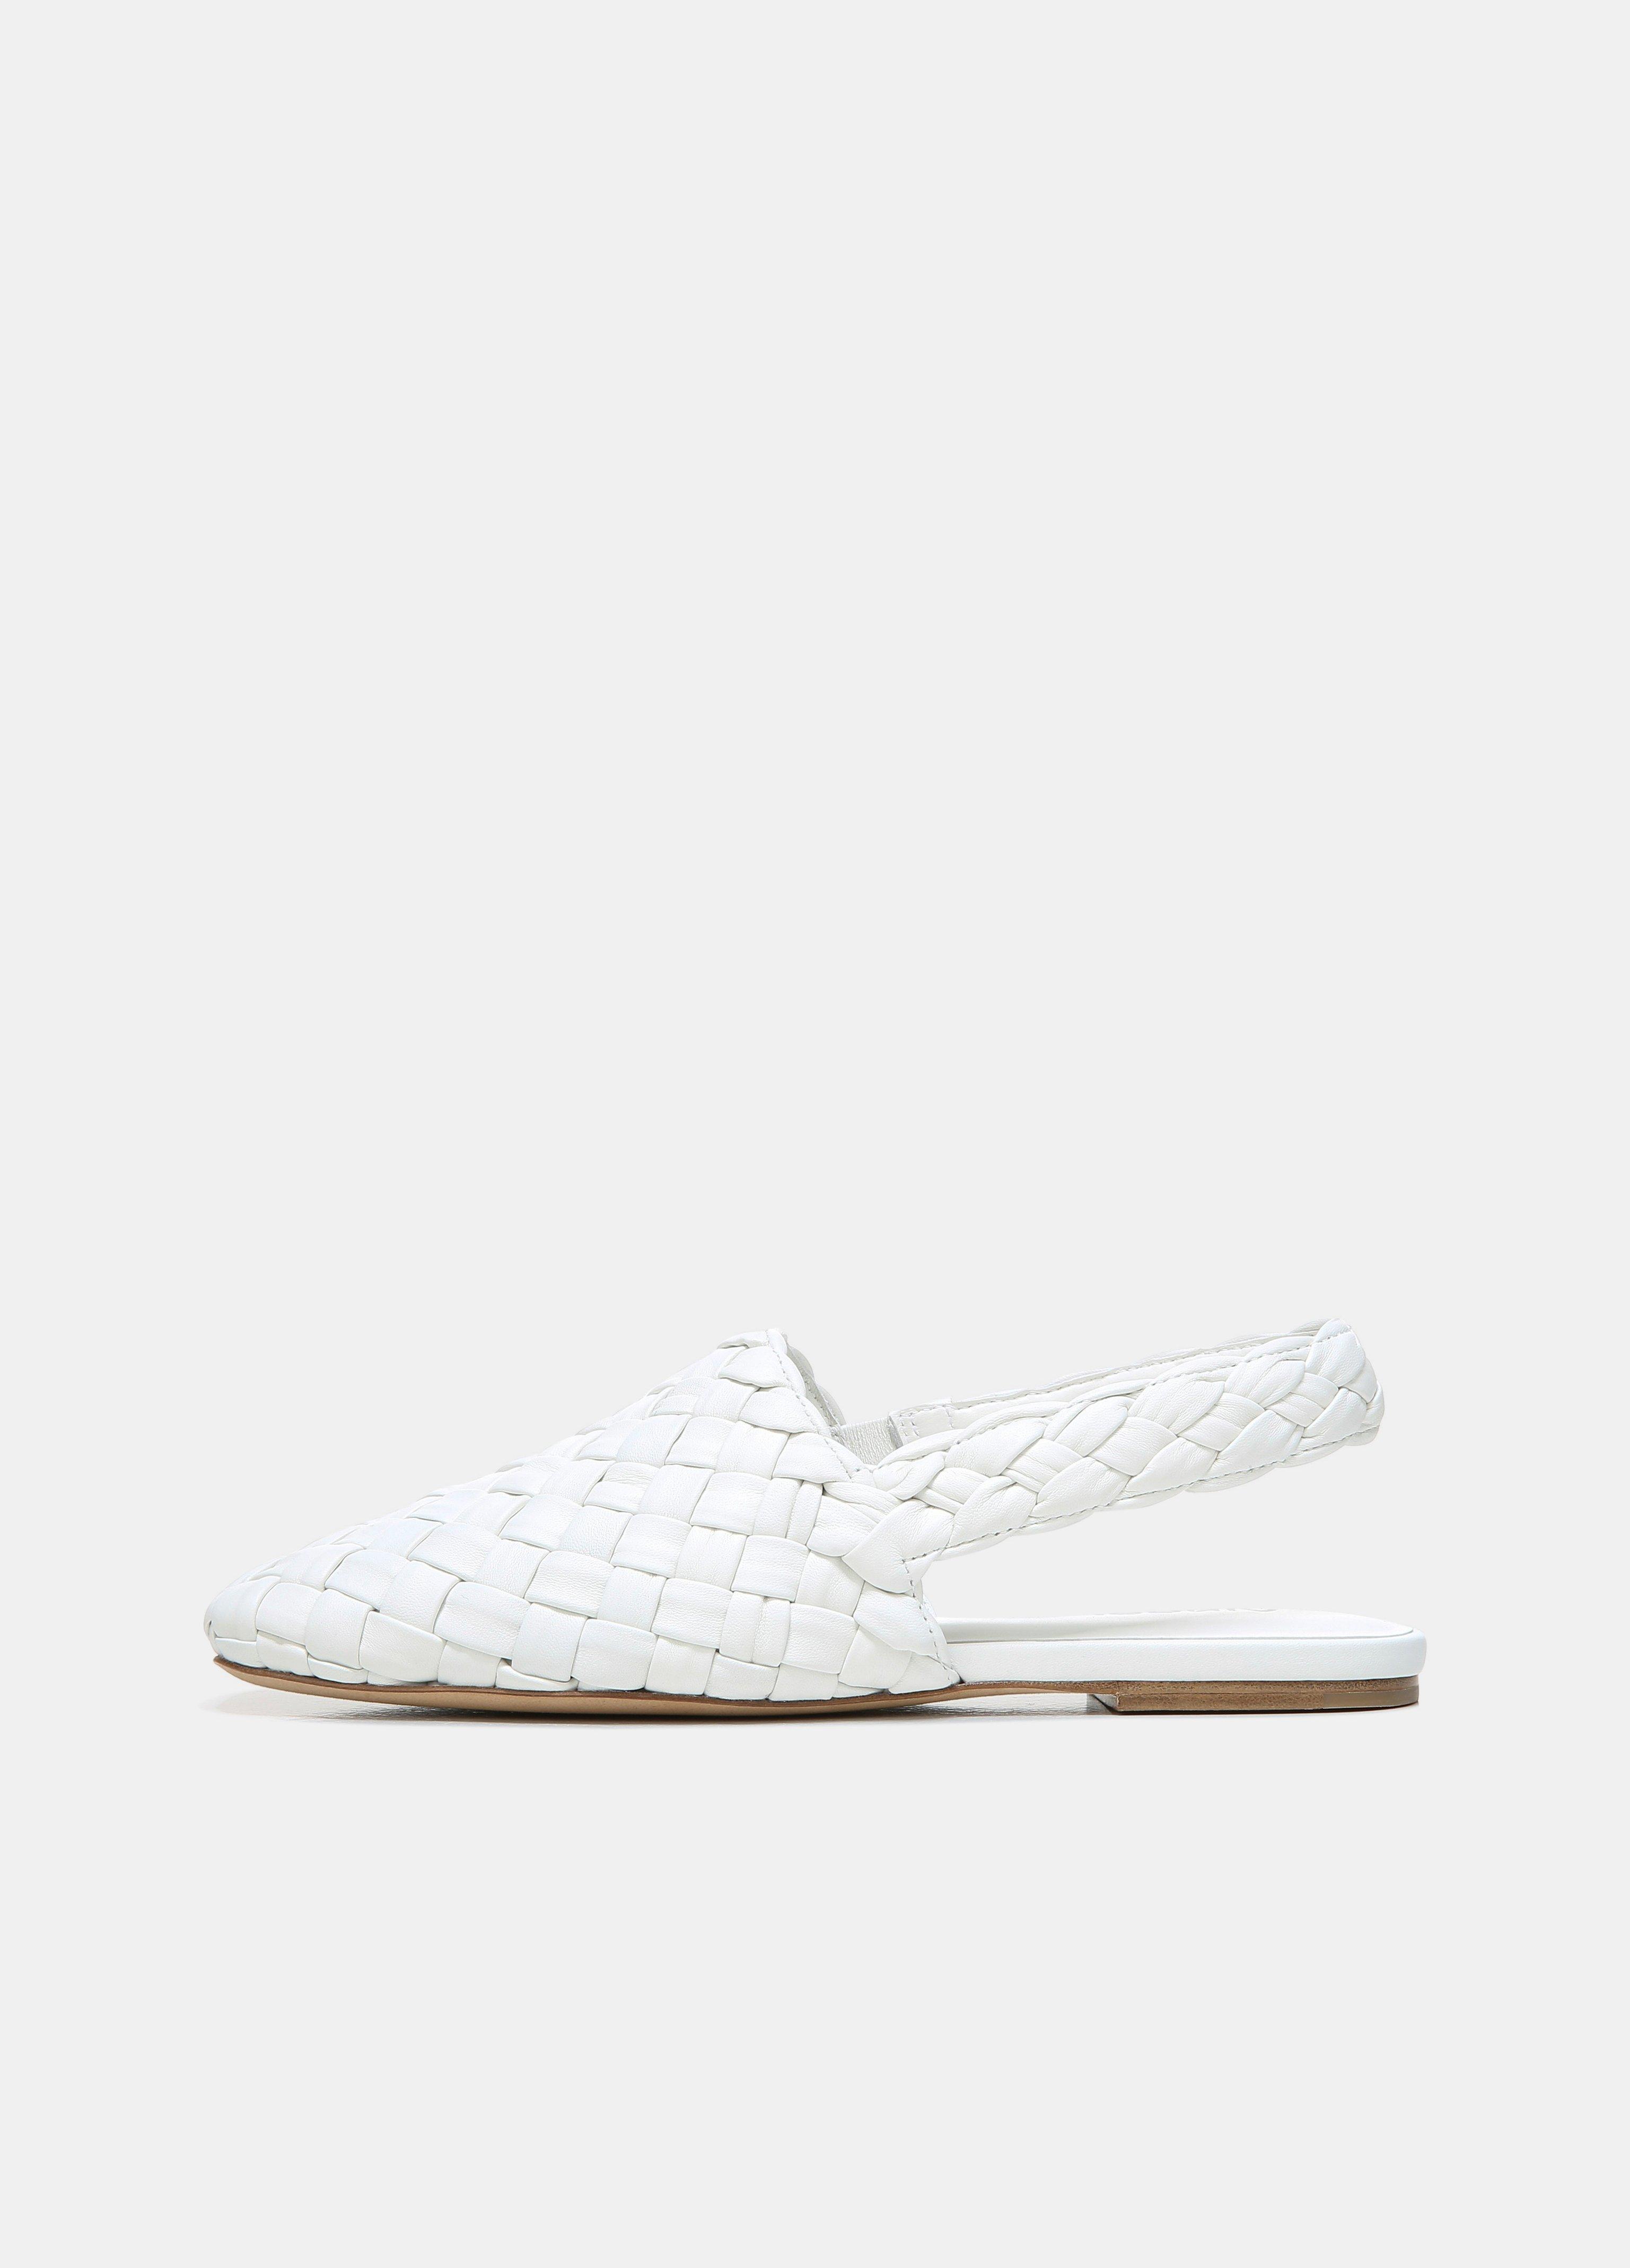 Cadot Leather Woven Shoe